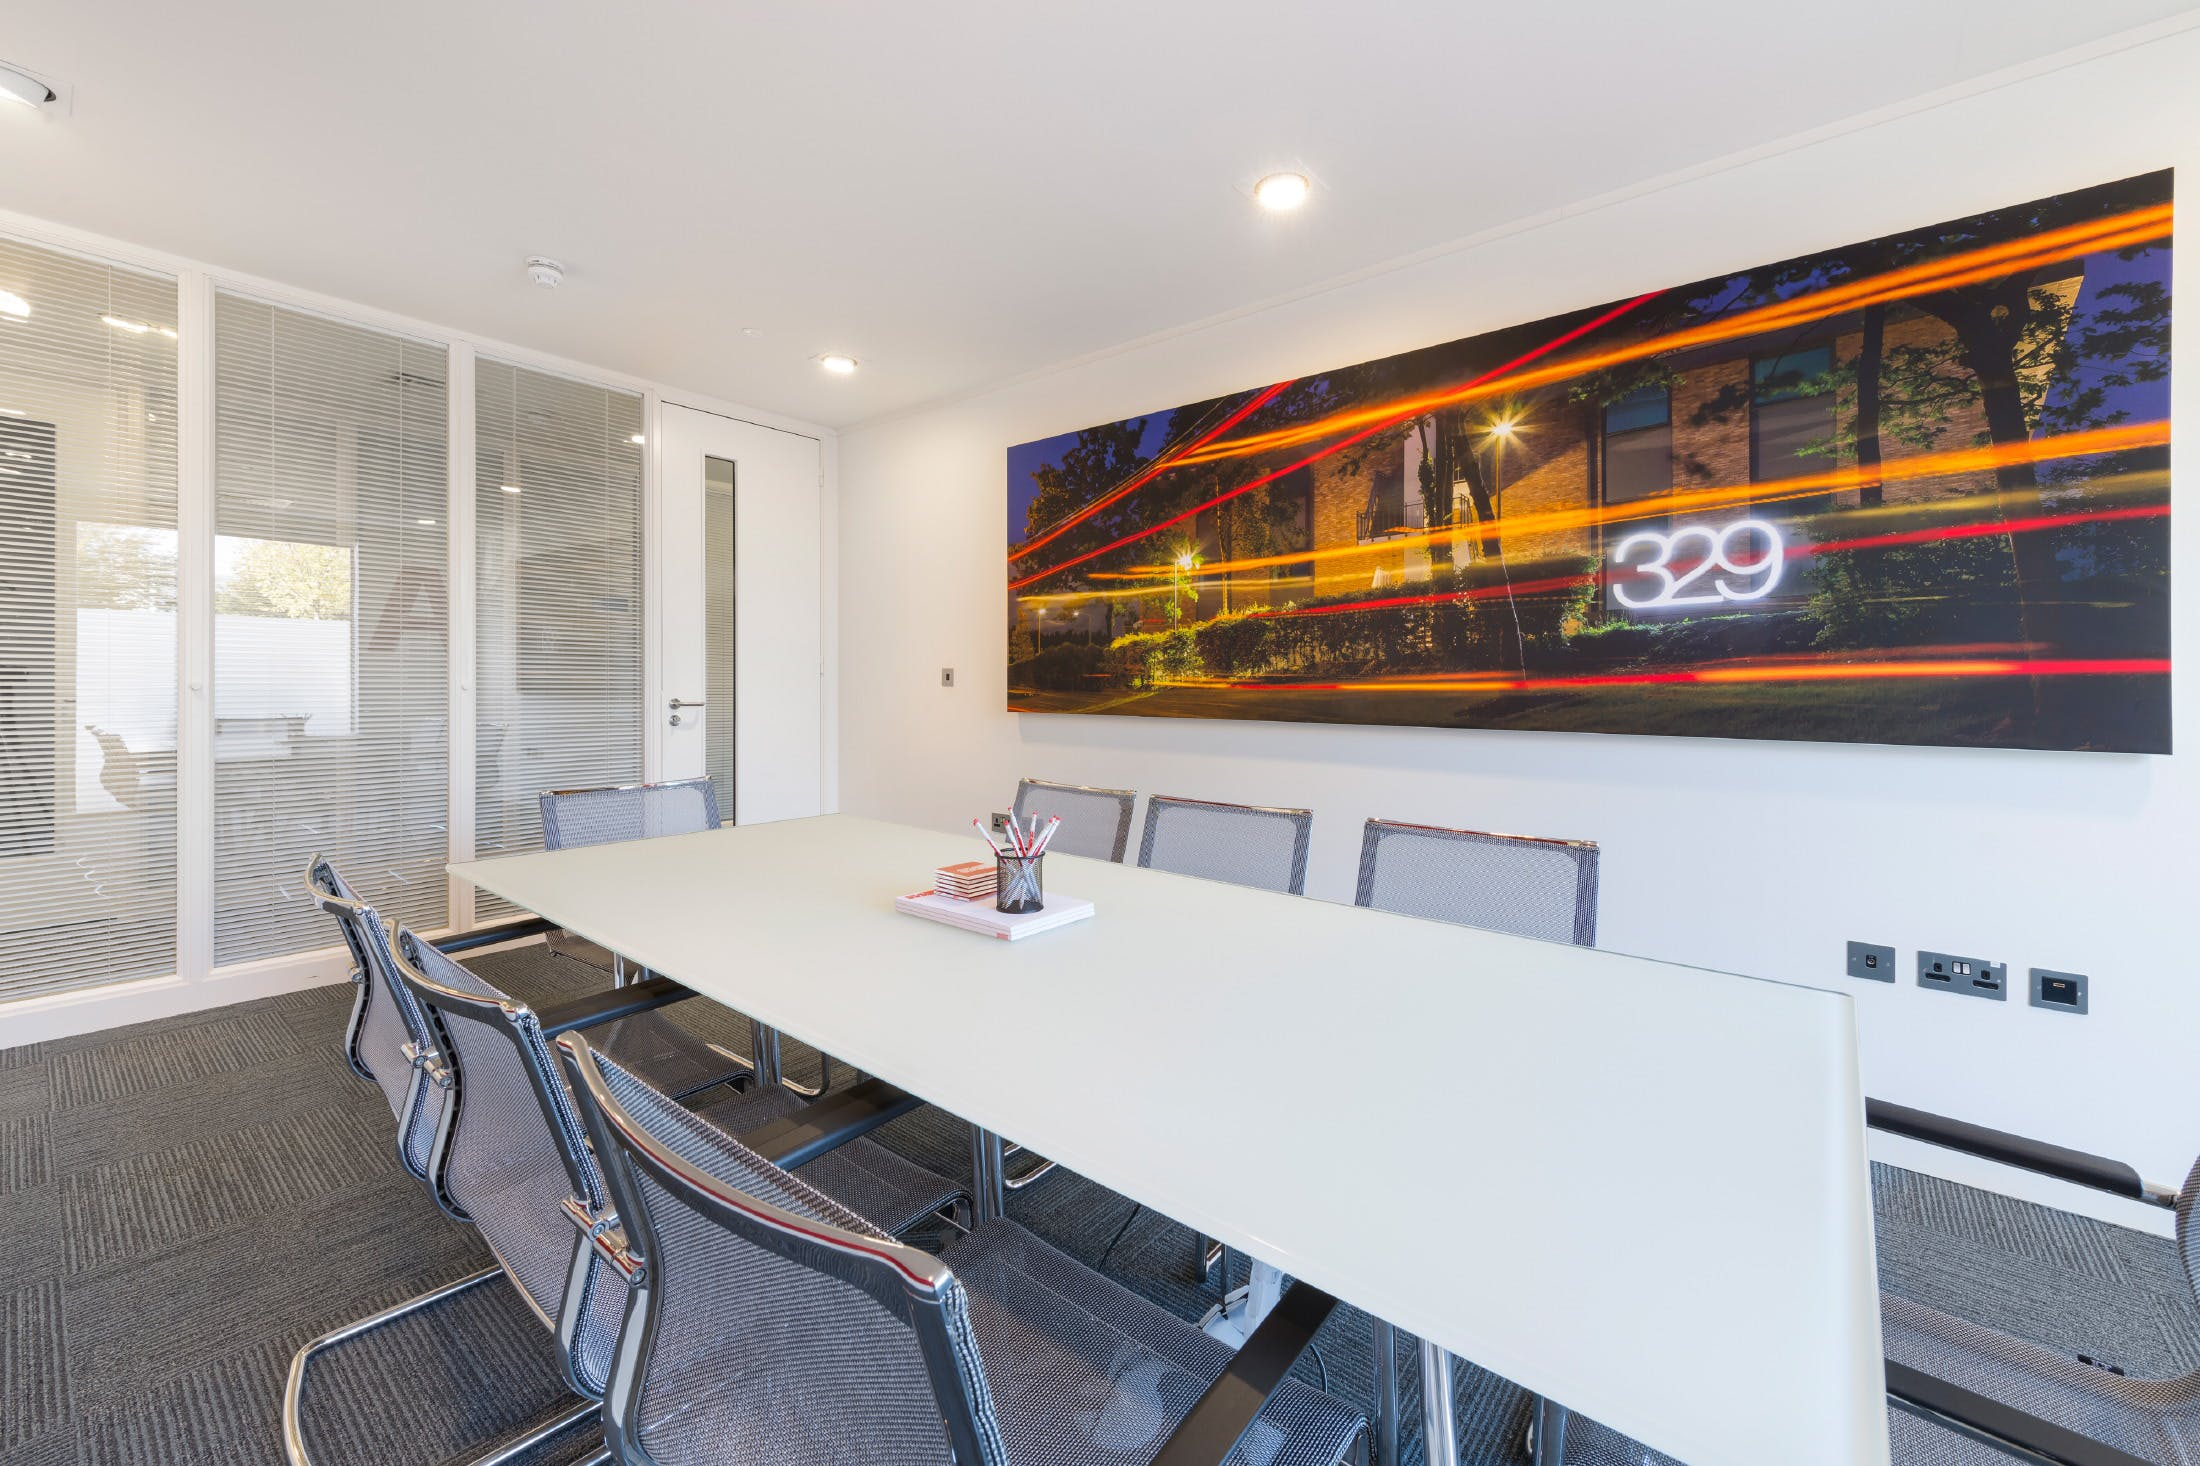 Suite 1.7, 329 Bracknell, Bracknell, Offices To Let - Meeting Room.jpg